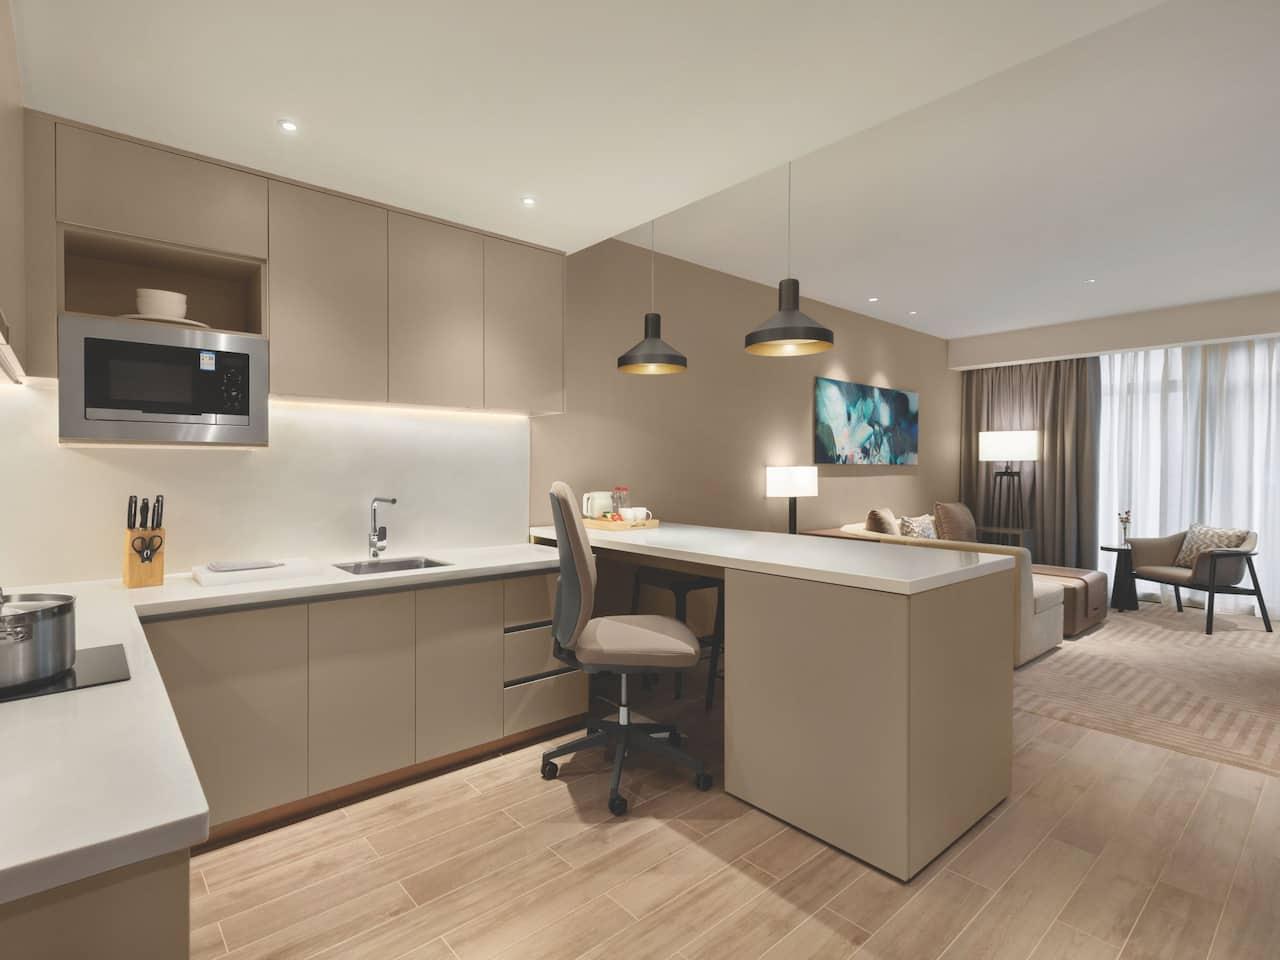 Kitchen Studio King Bed w Sofa Bed